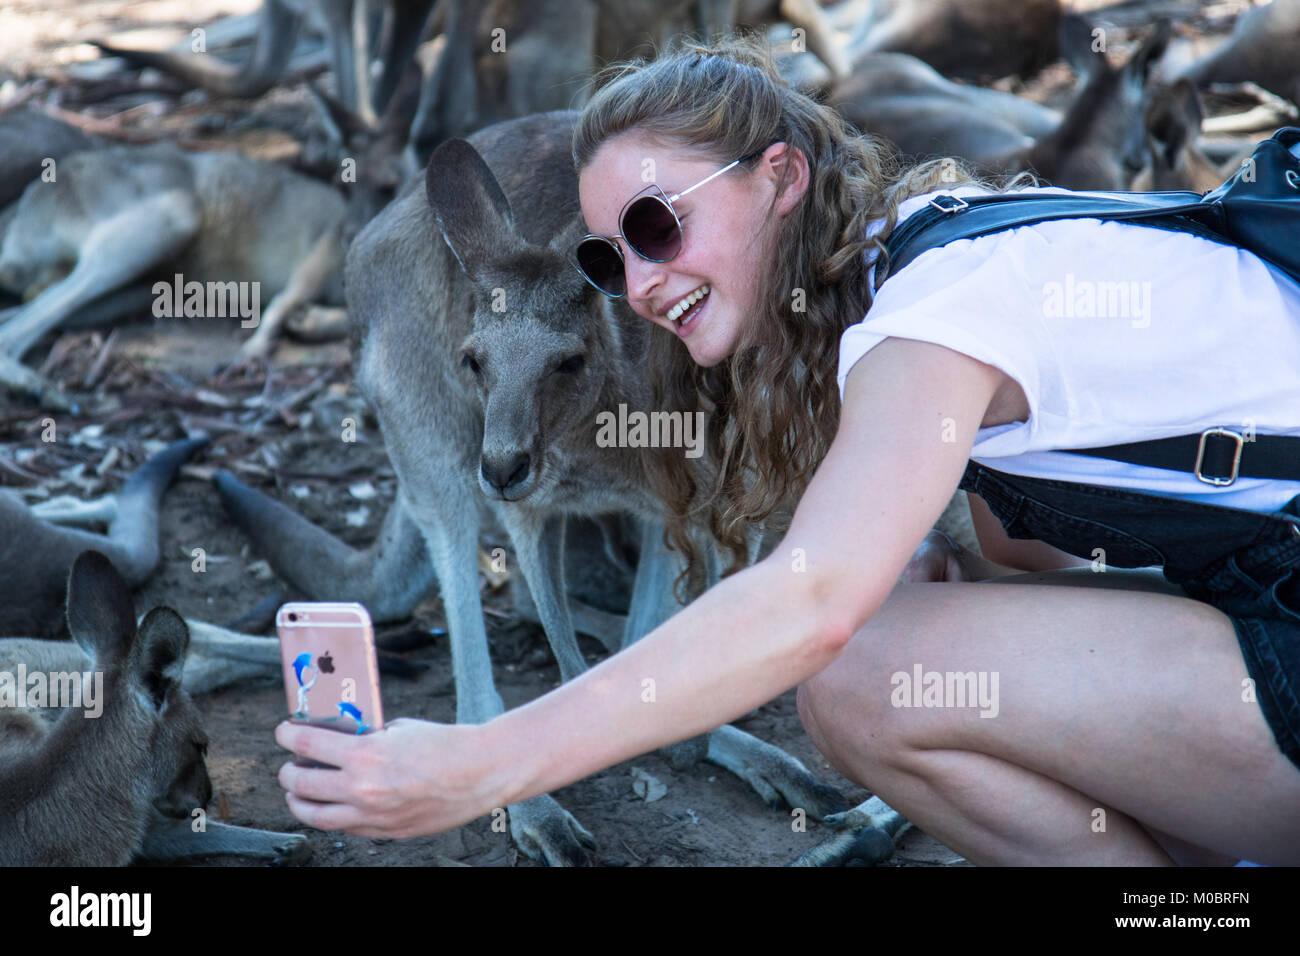 Young woman takes selfie with kangaroo at Brisbane Koala Sanctuary - Stock Image